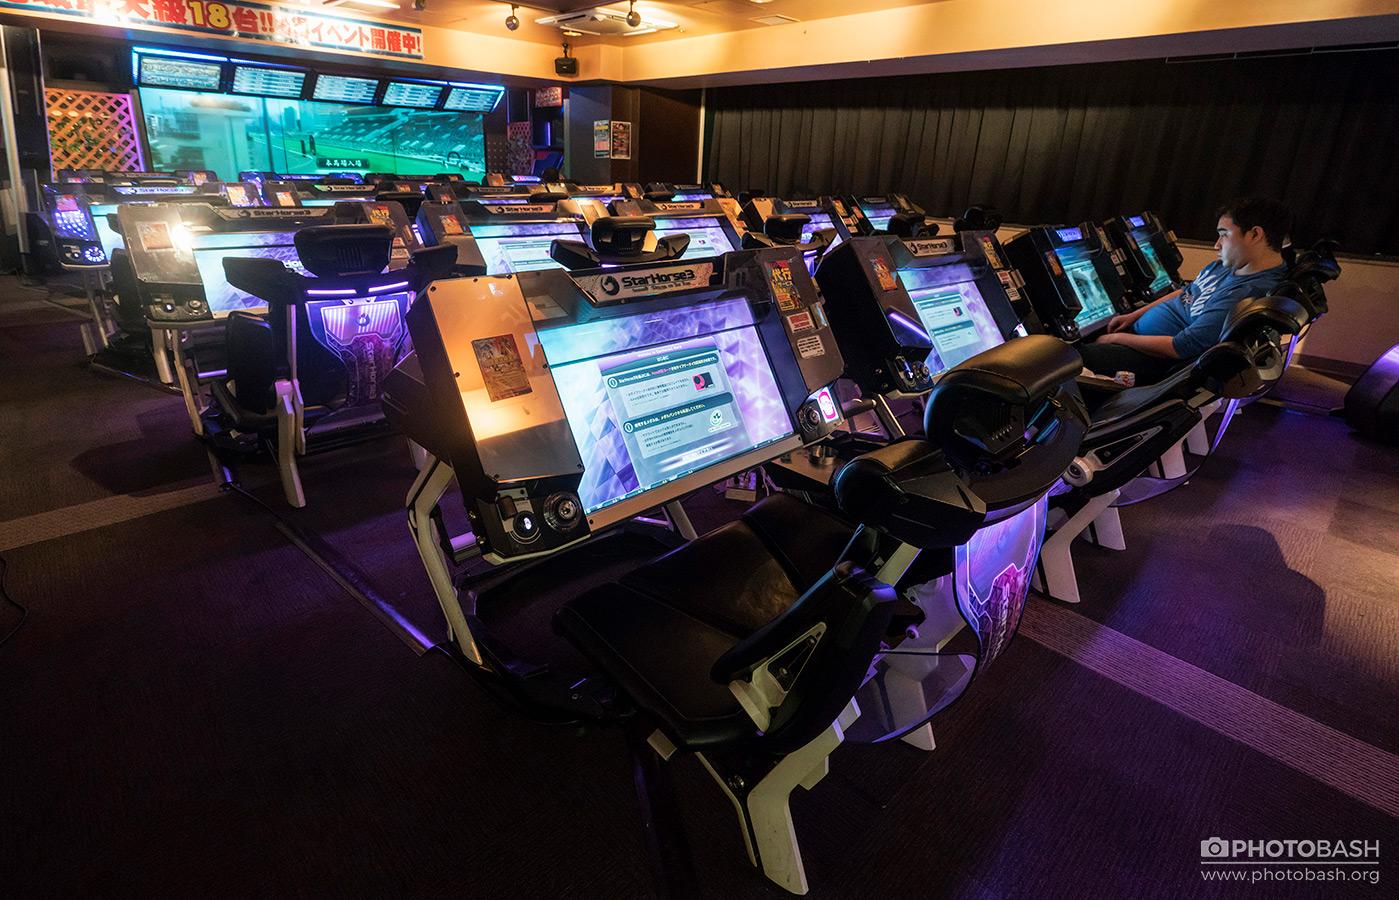 Arcade-Cyberpunk-Sci-Fi-Screen-Displays.jpg